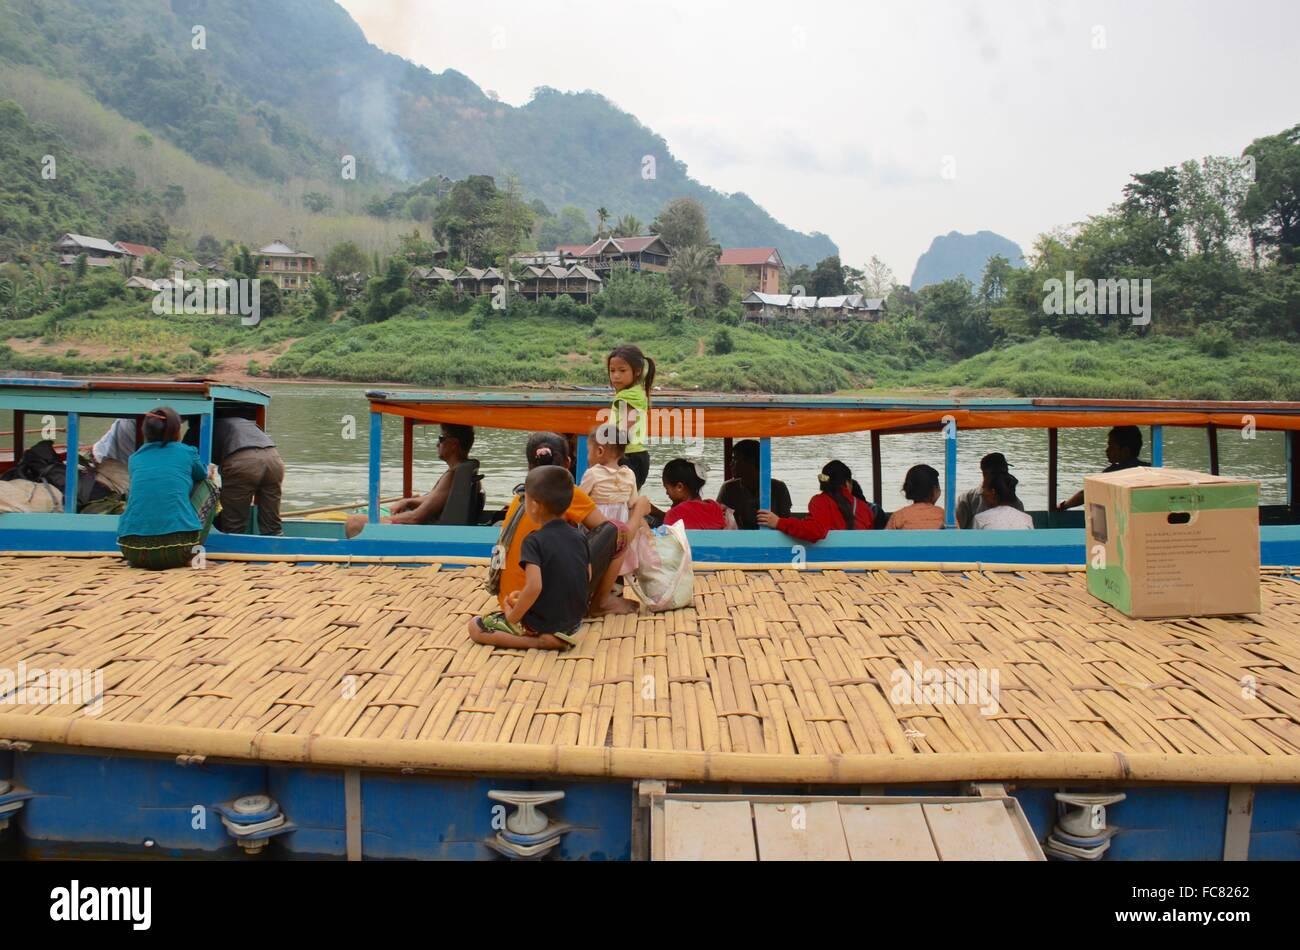 River Life Nong Khiaw Laos - Stock Image